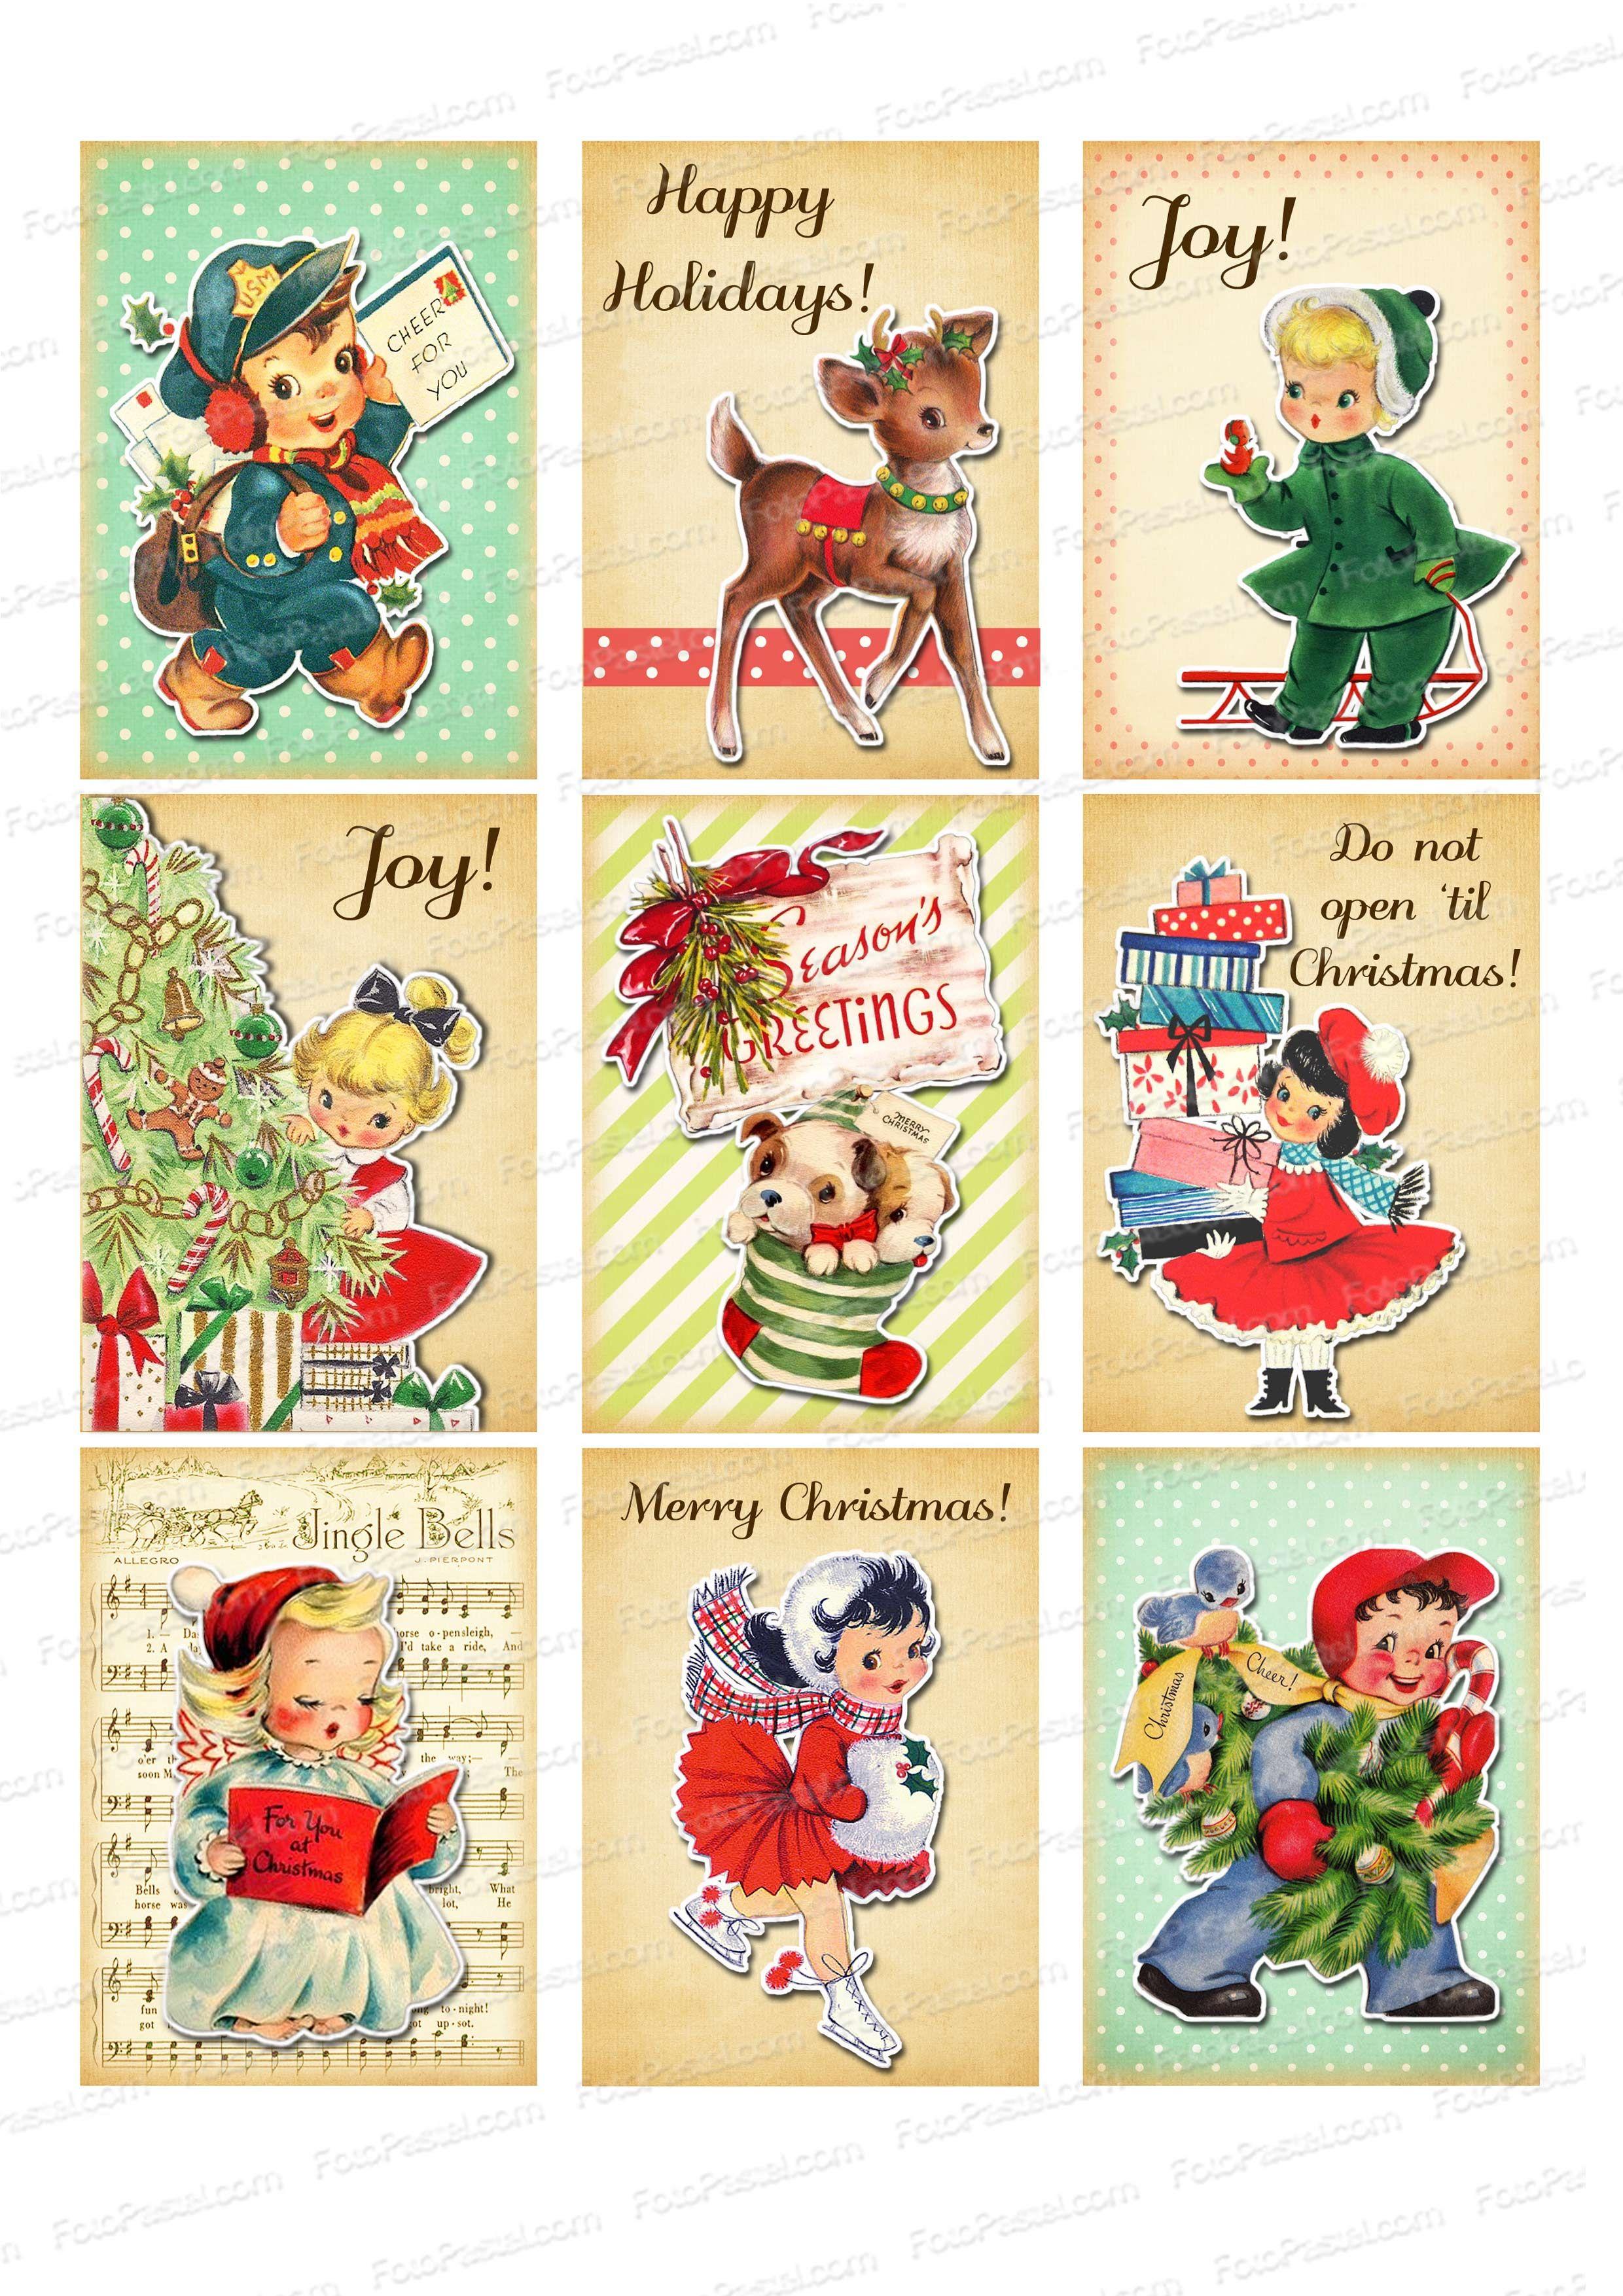 Luxe Image Vintage De Noel A Imprimer